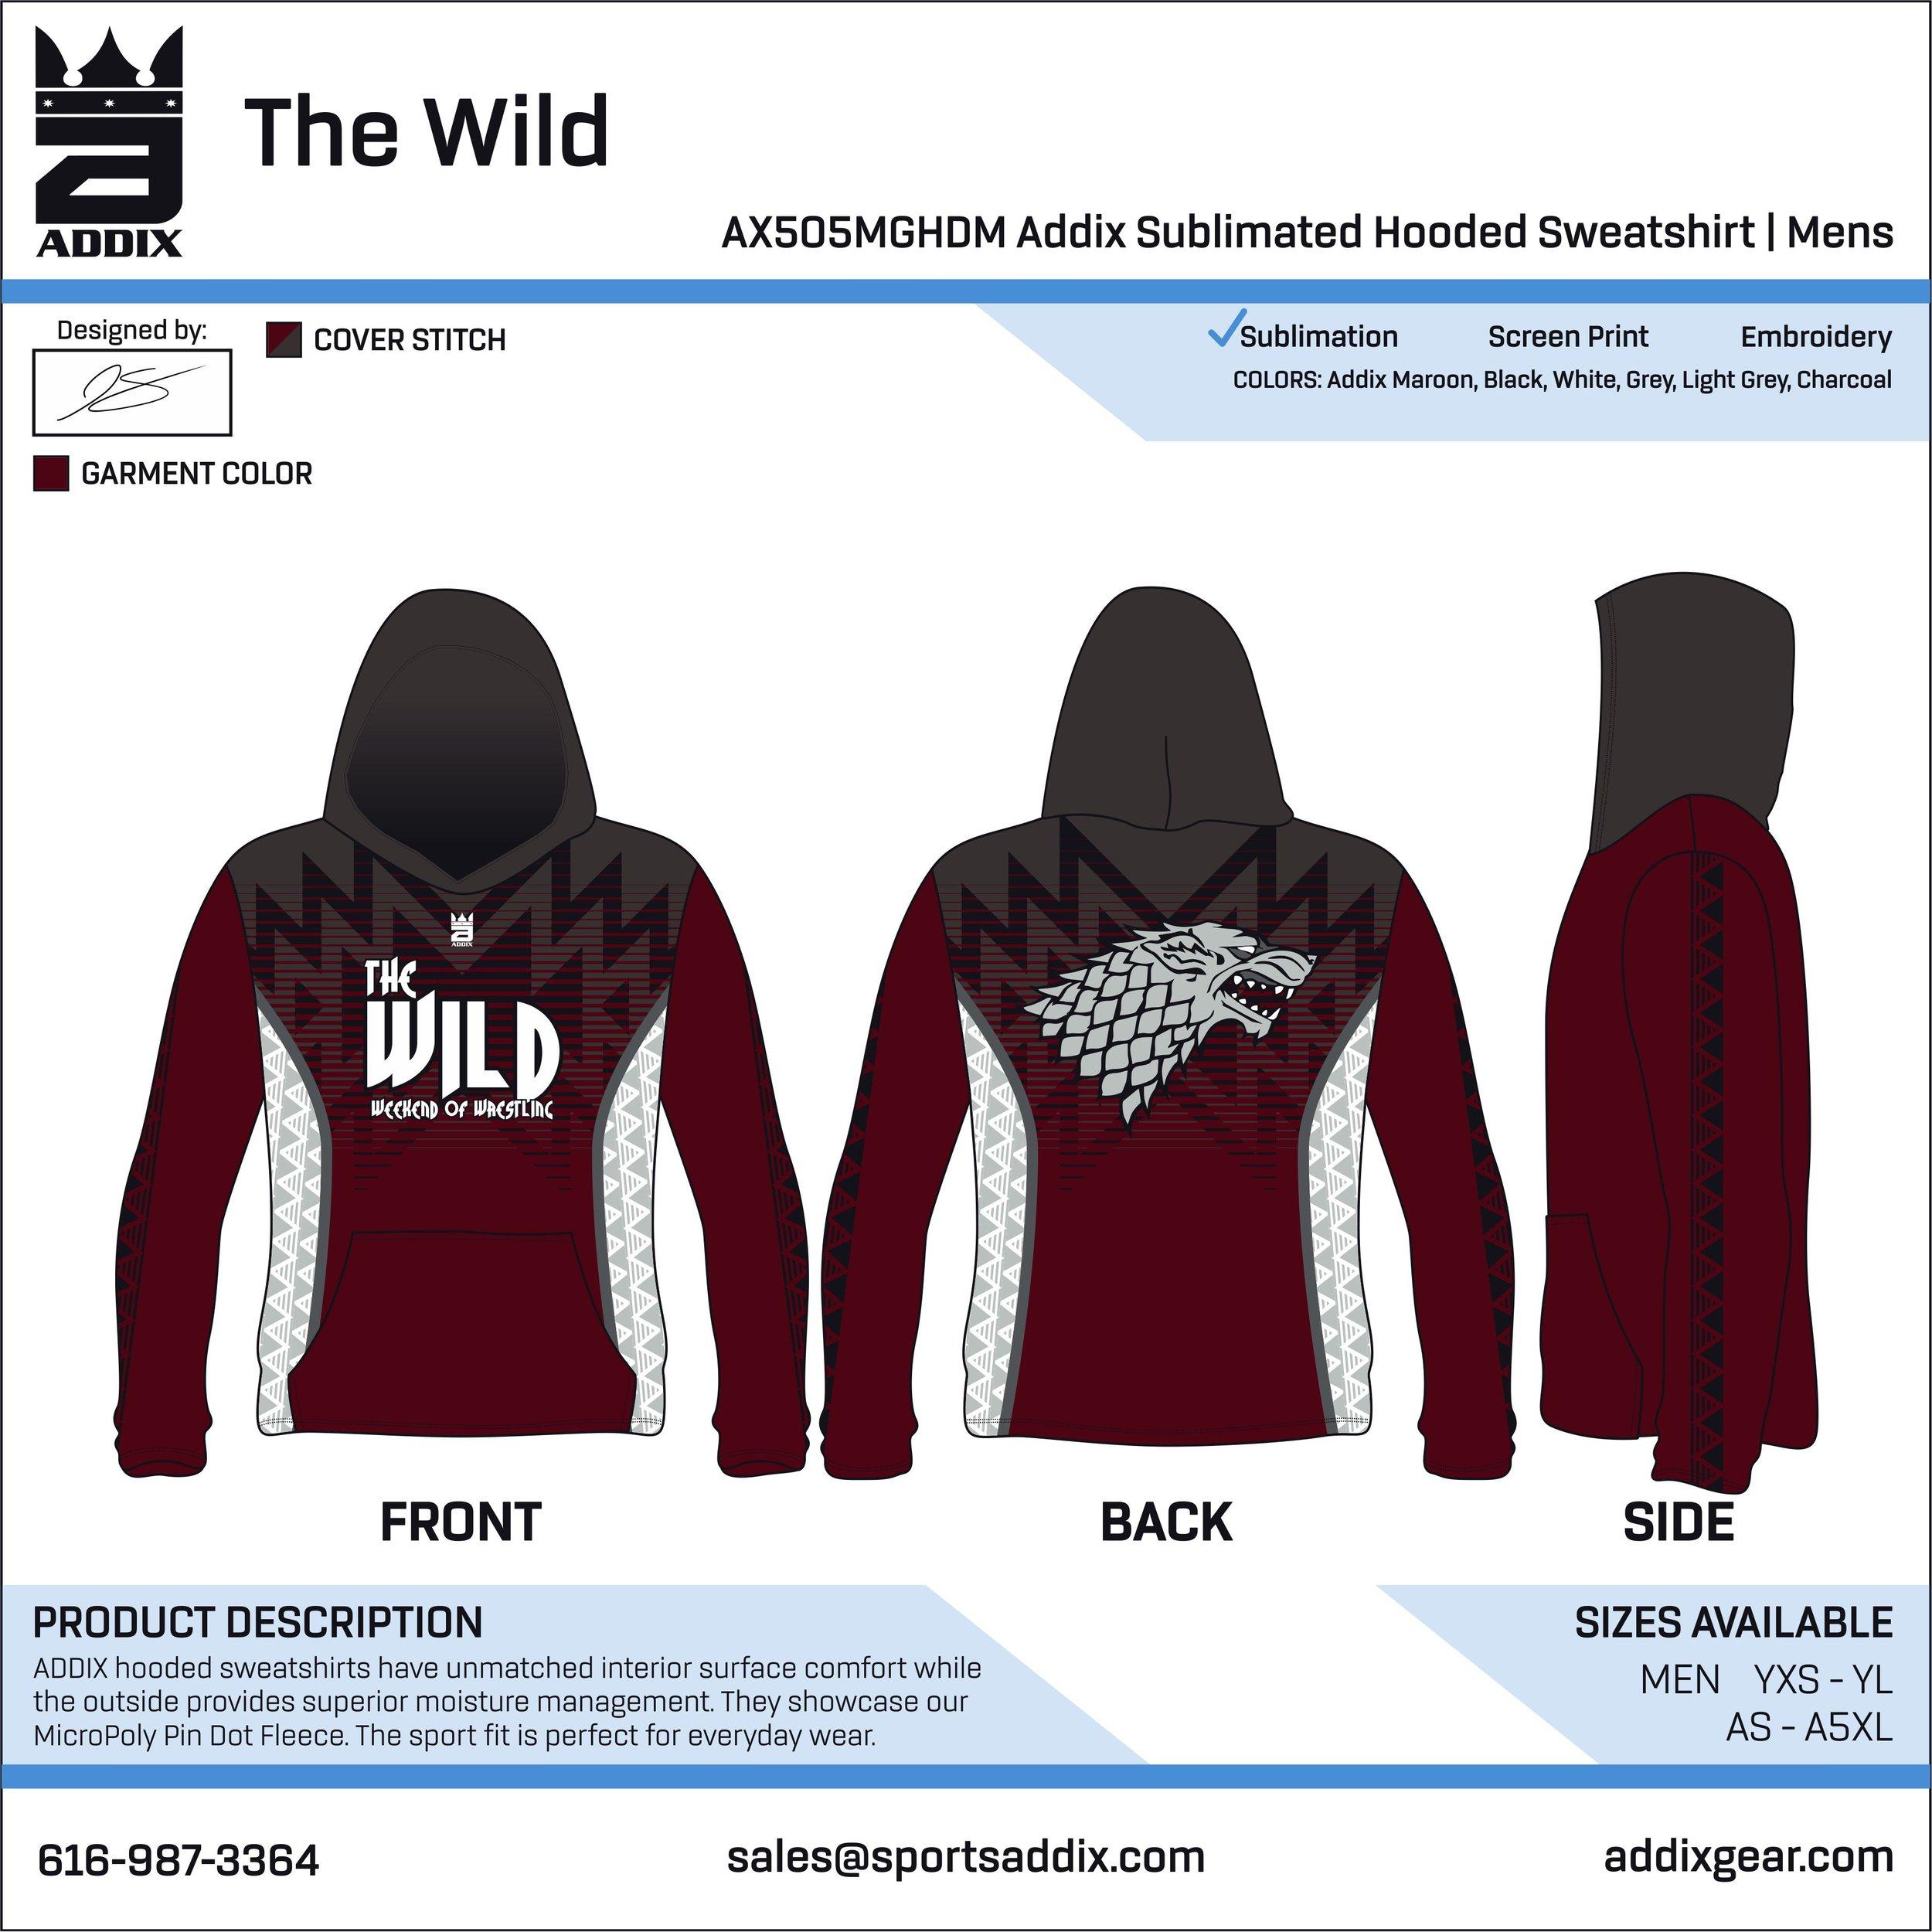 The Wild_2019_3-5_JE_Full Sub Hoodie.jpg